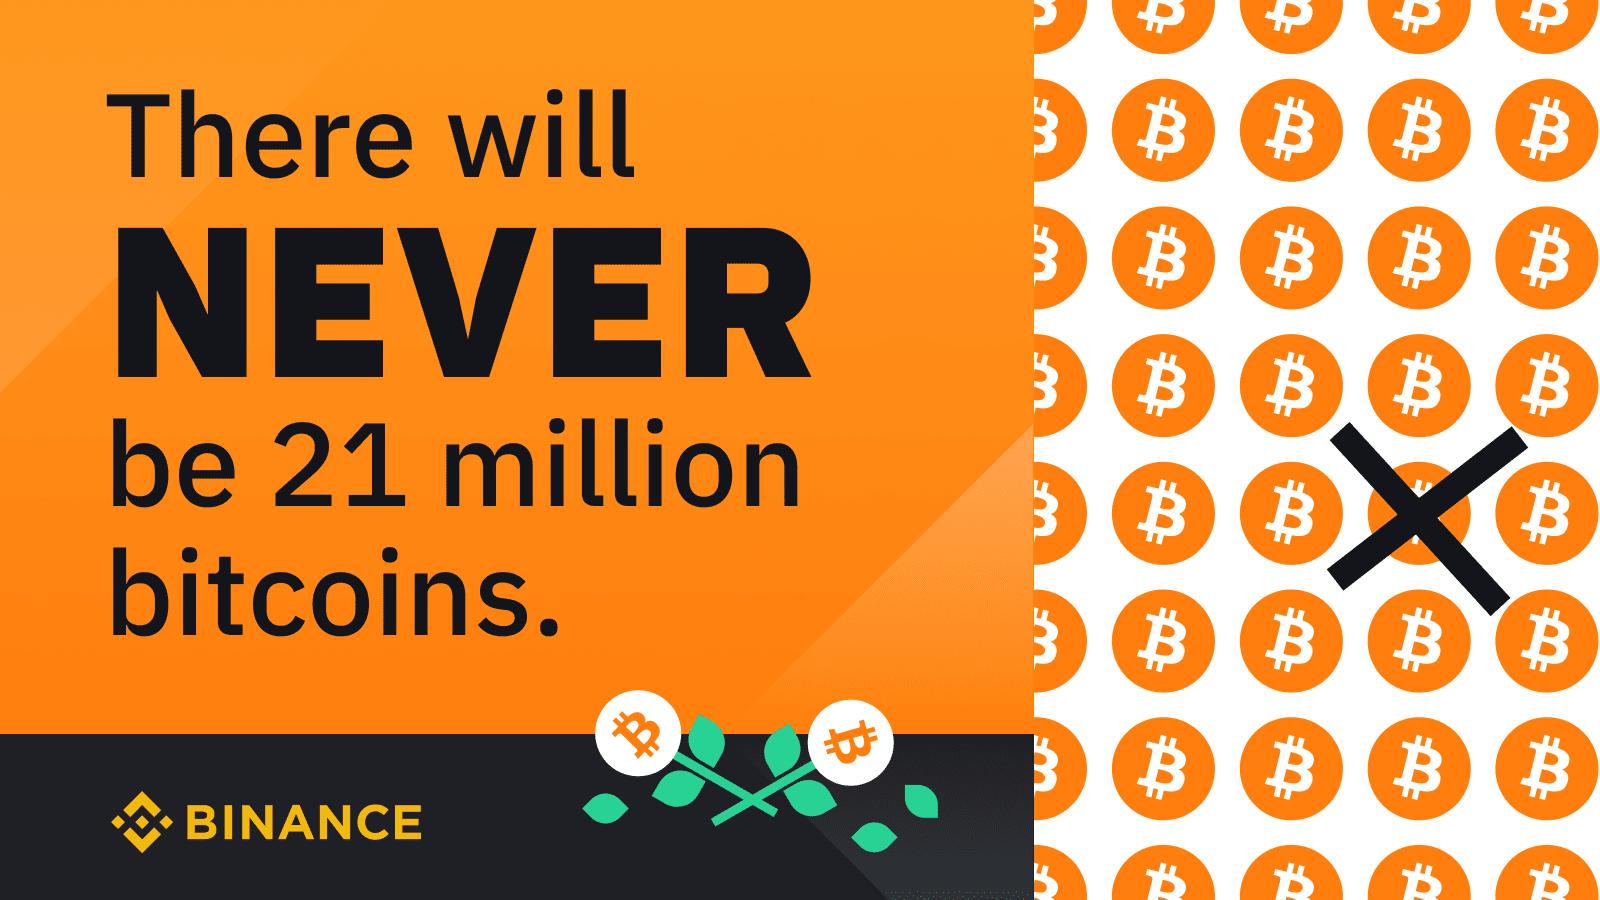 When will all 21 million bitcoins be mined zamora vs trujillanos bettingexpert